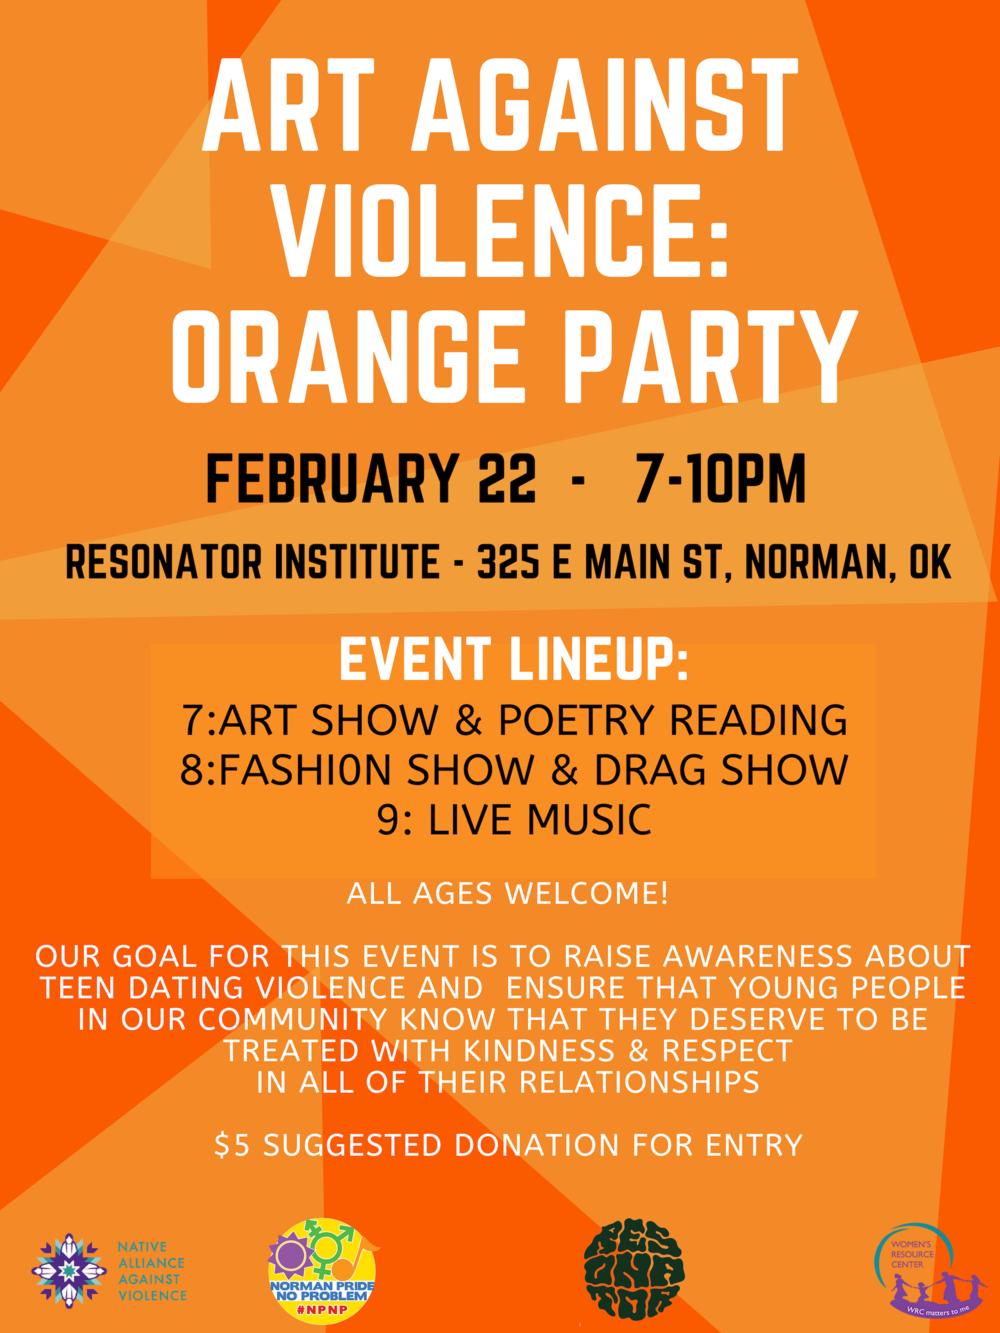 Art Against Violence: Orange Party